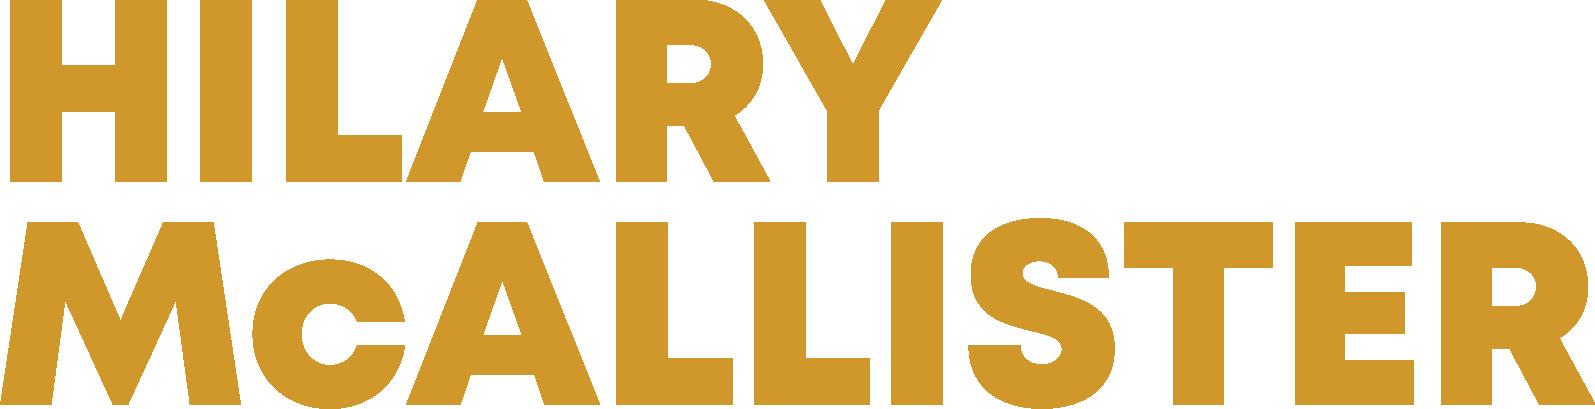 HILARY McALLISTER